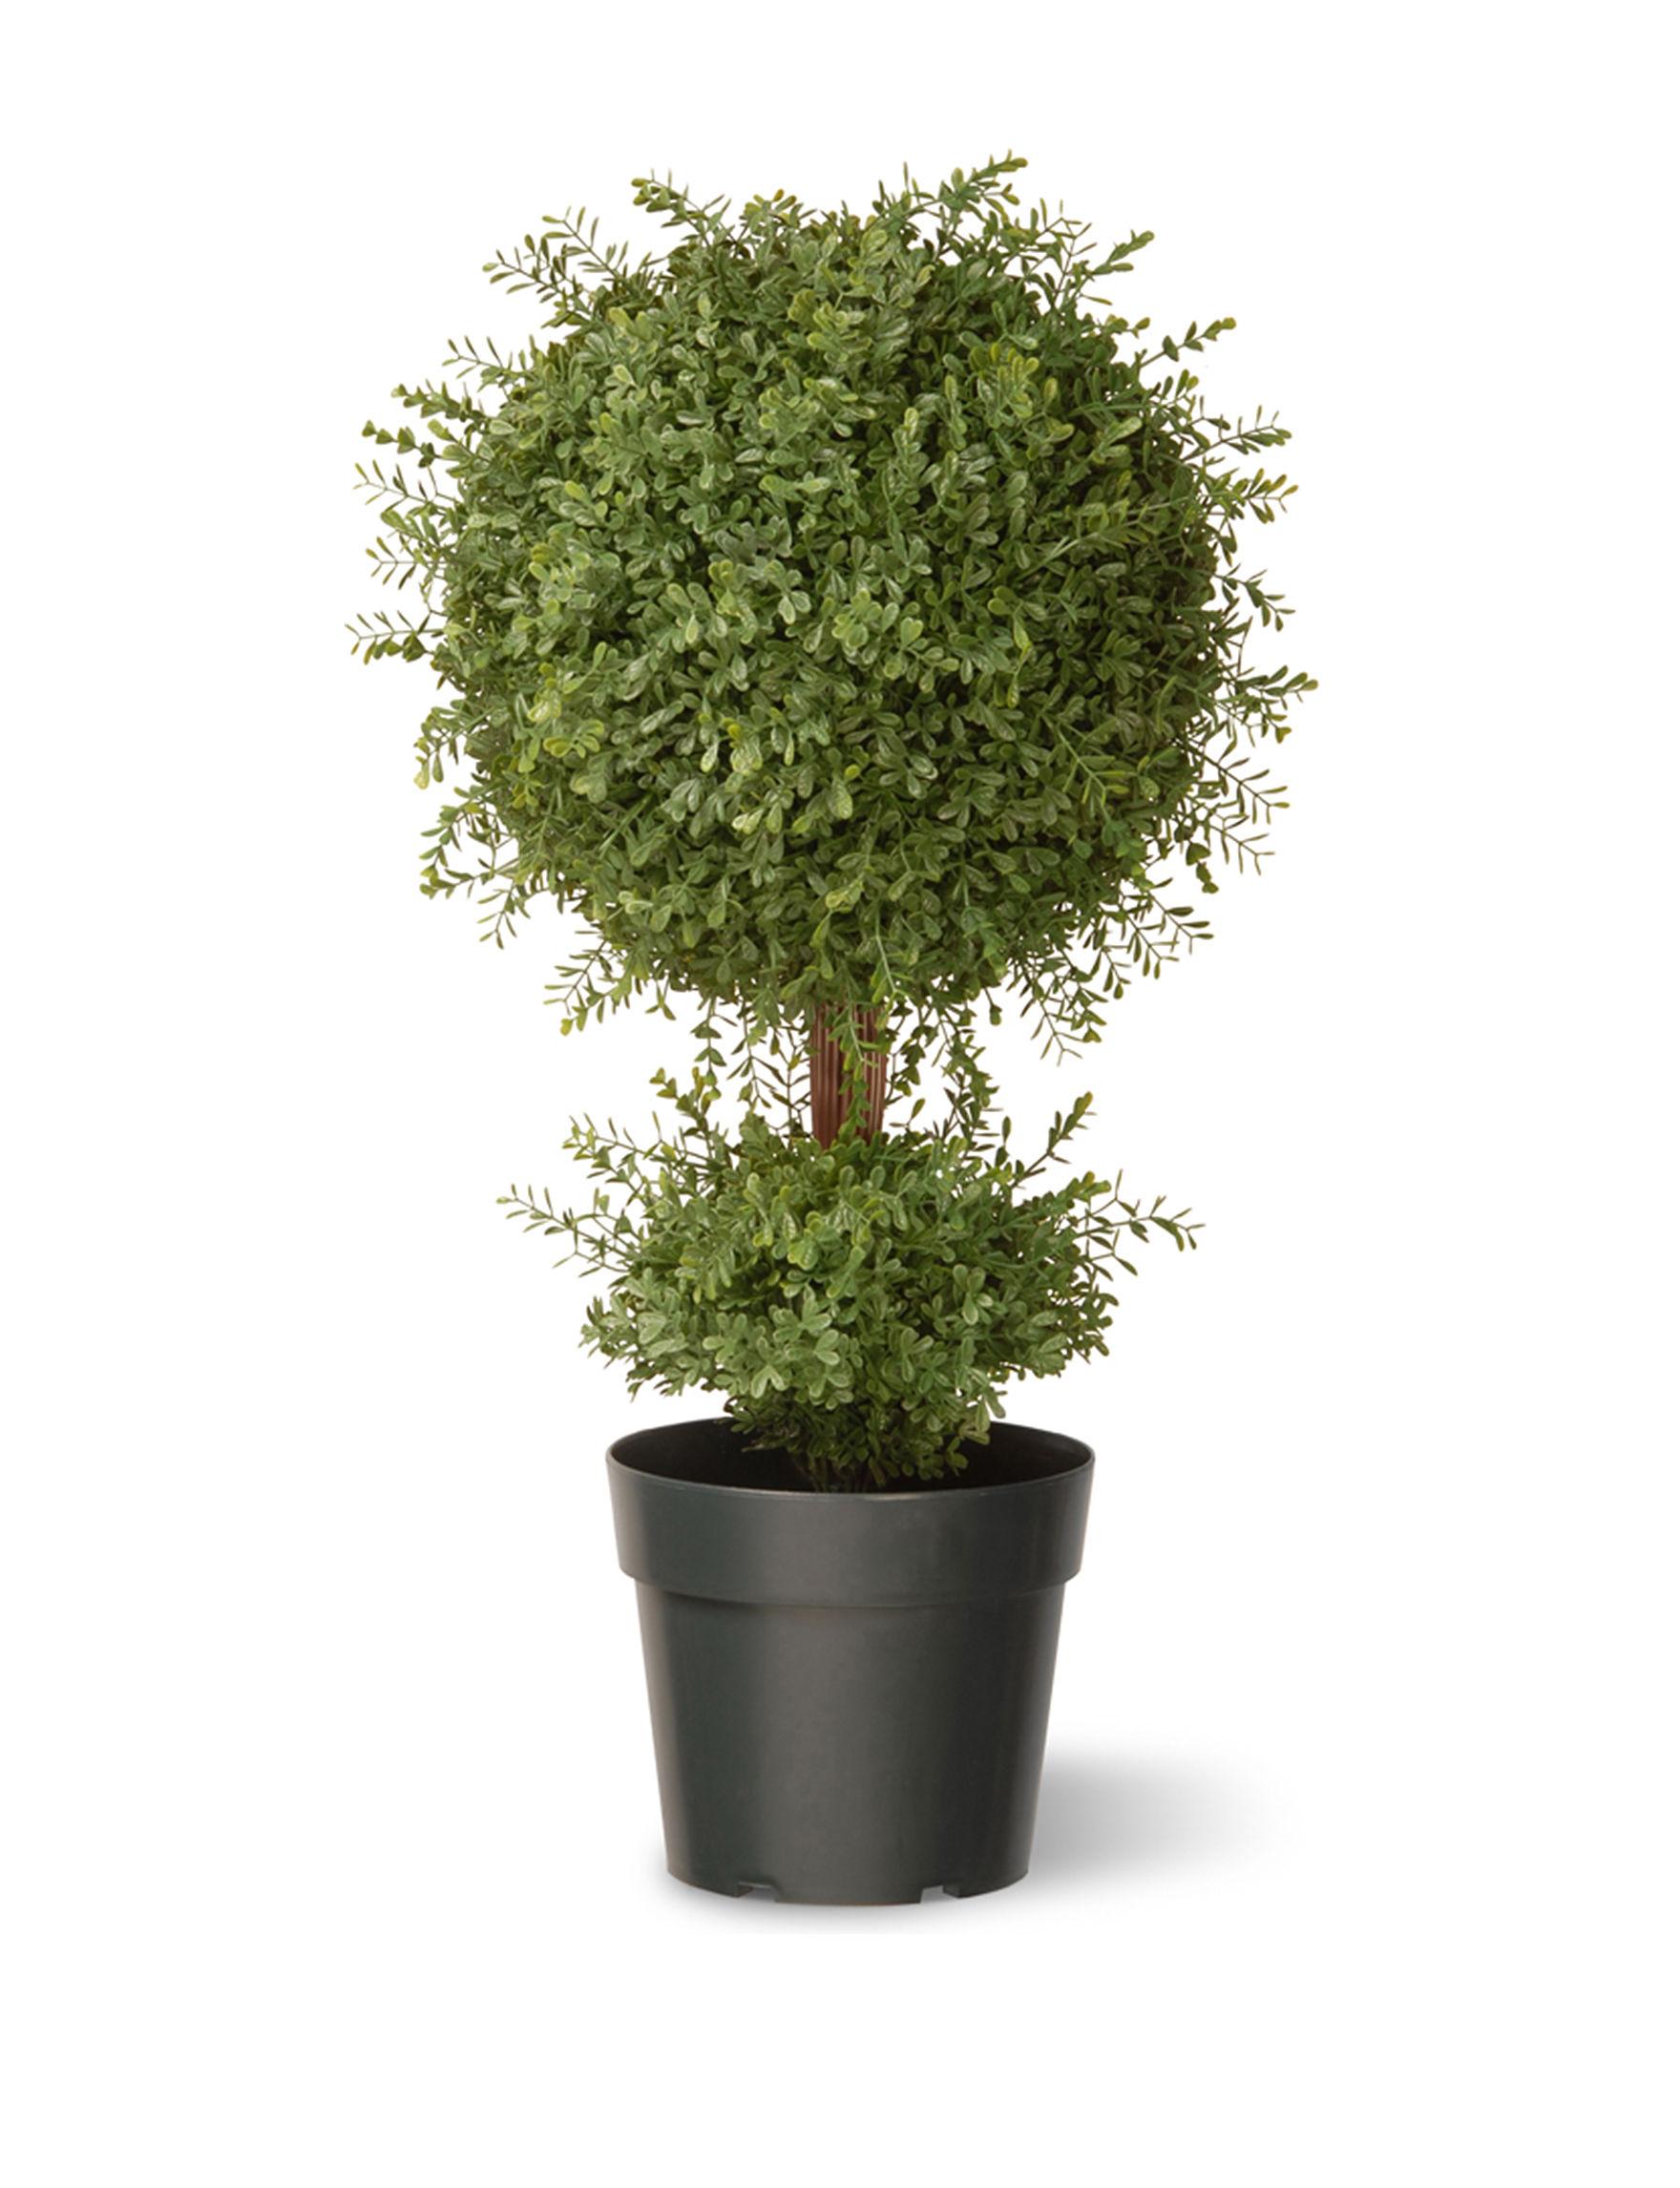 National Tree Company Green Faux Plants Outdoor Decor